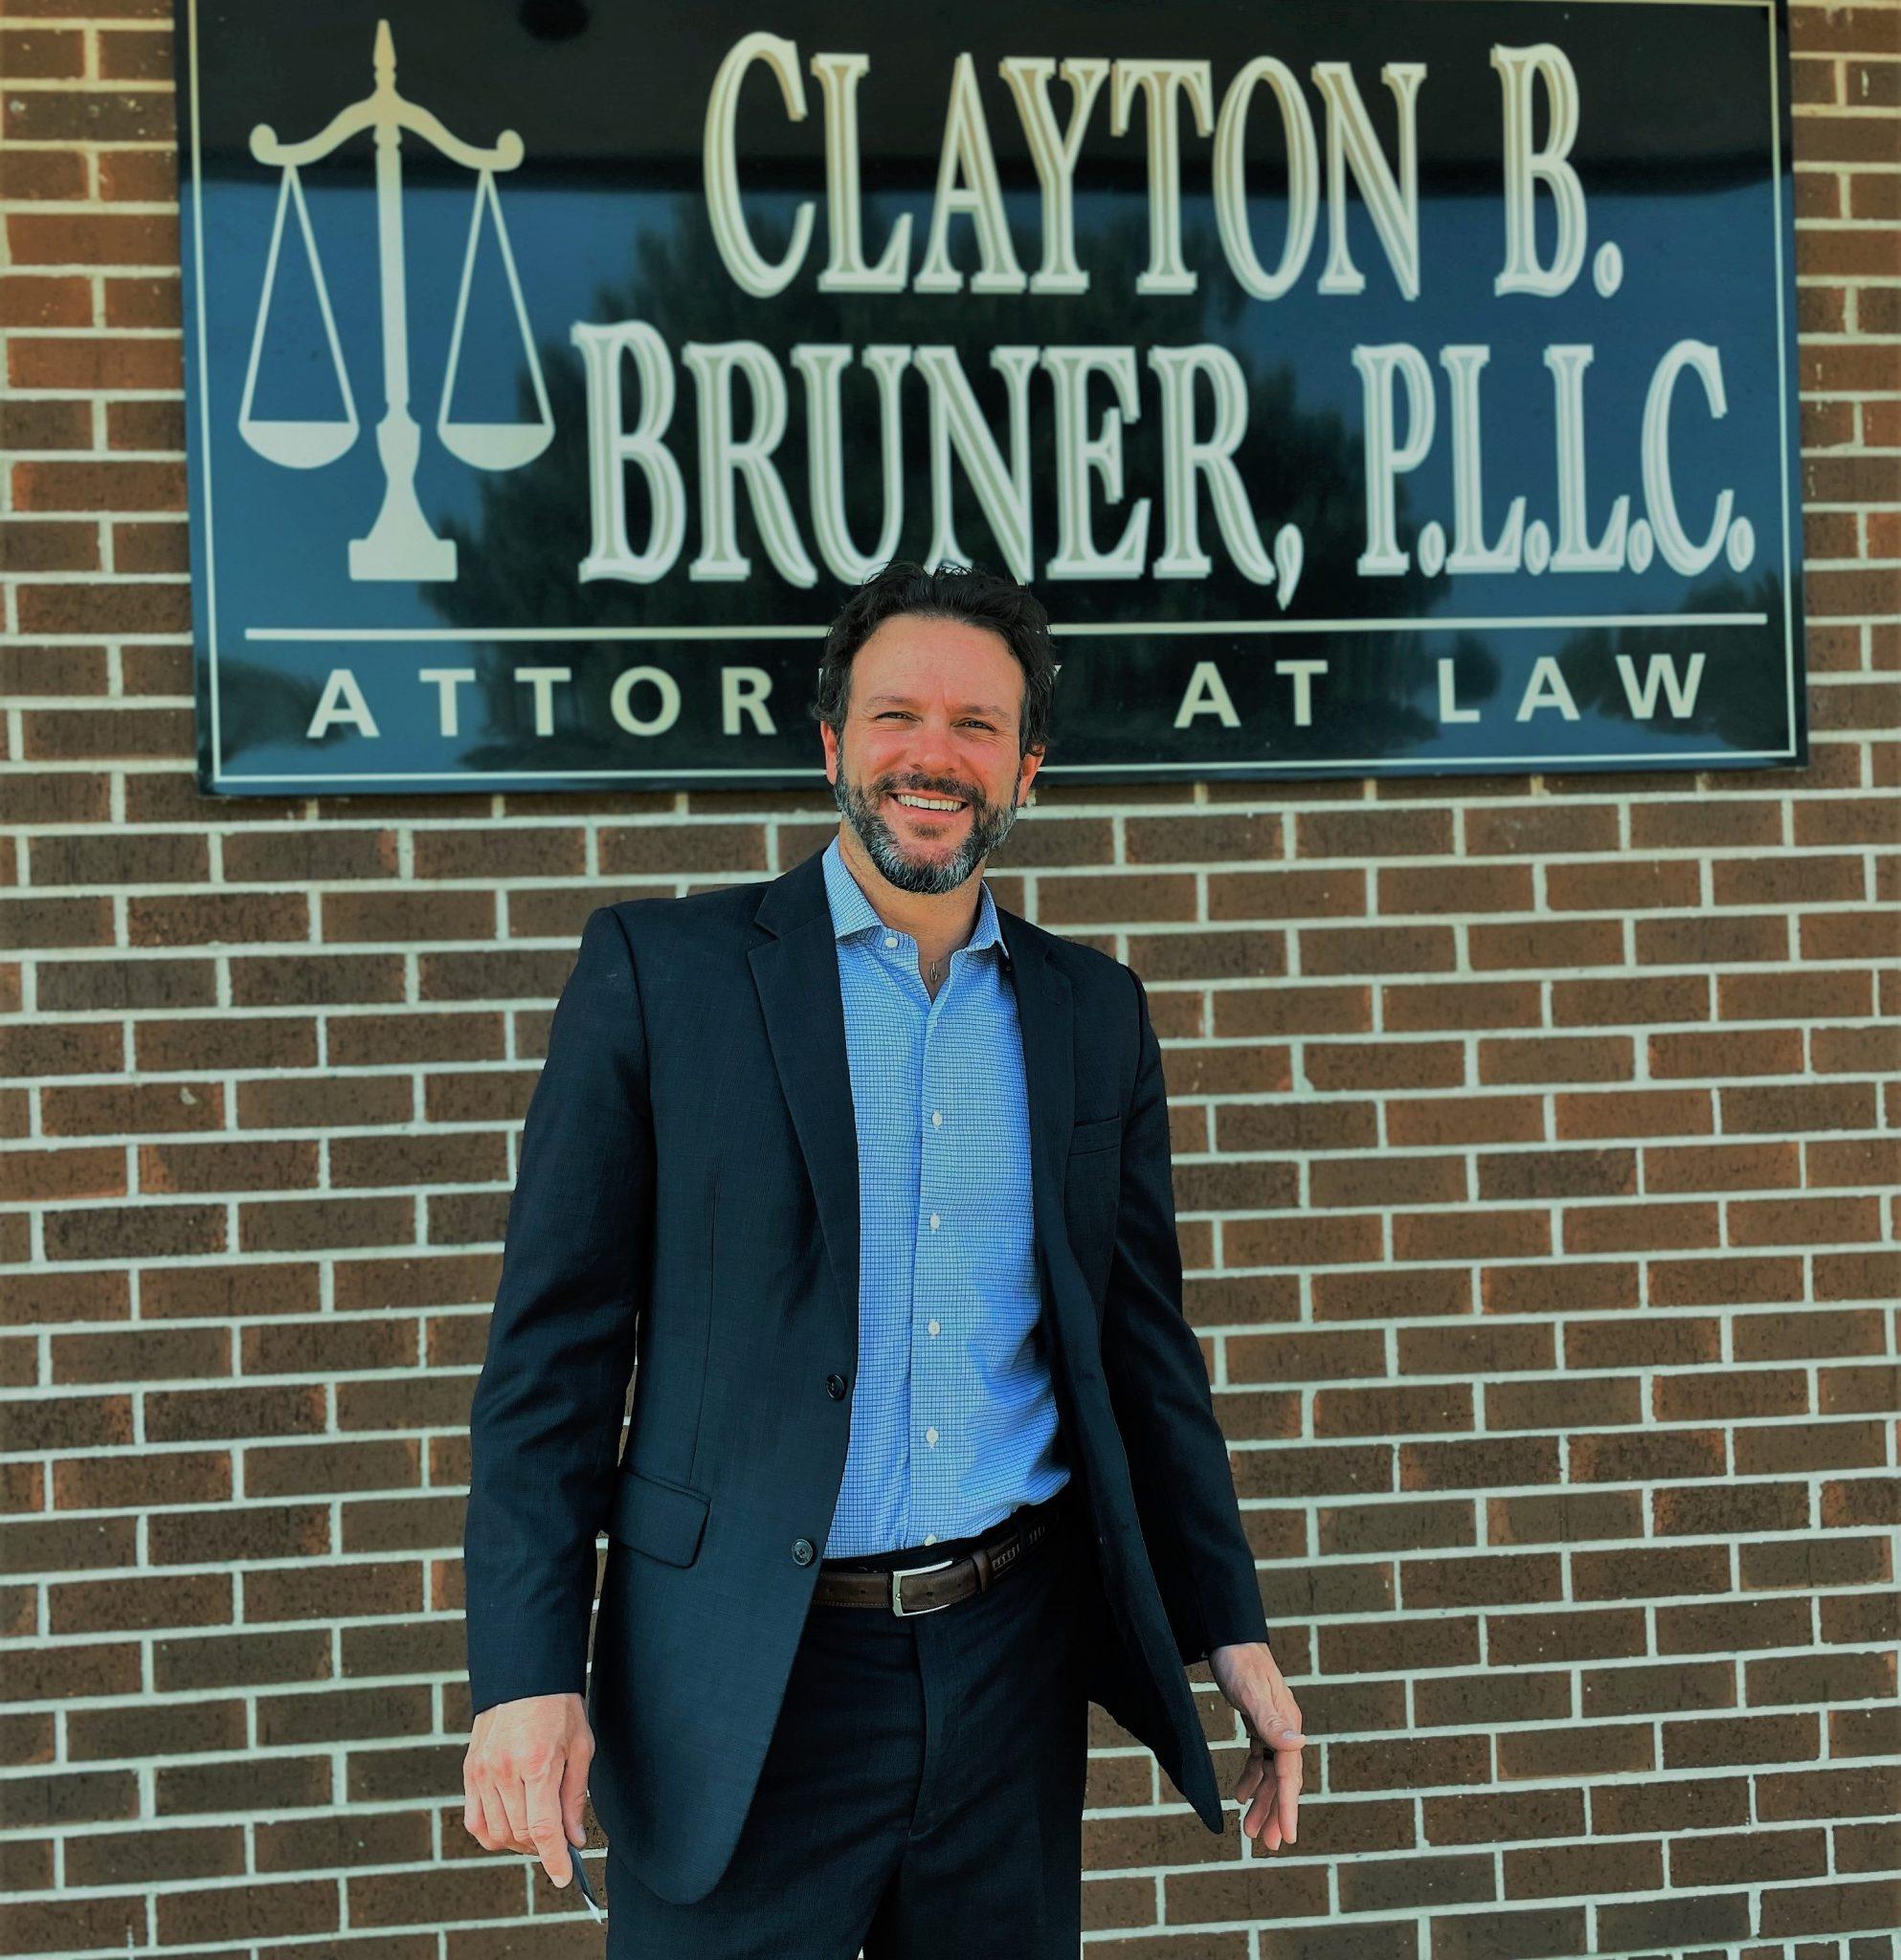 Clay Buruner